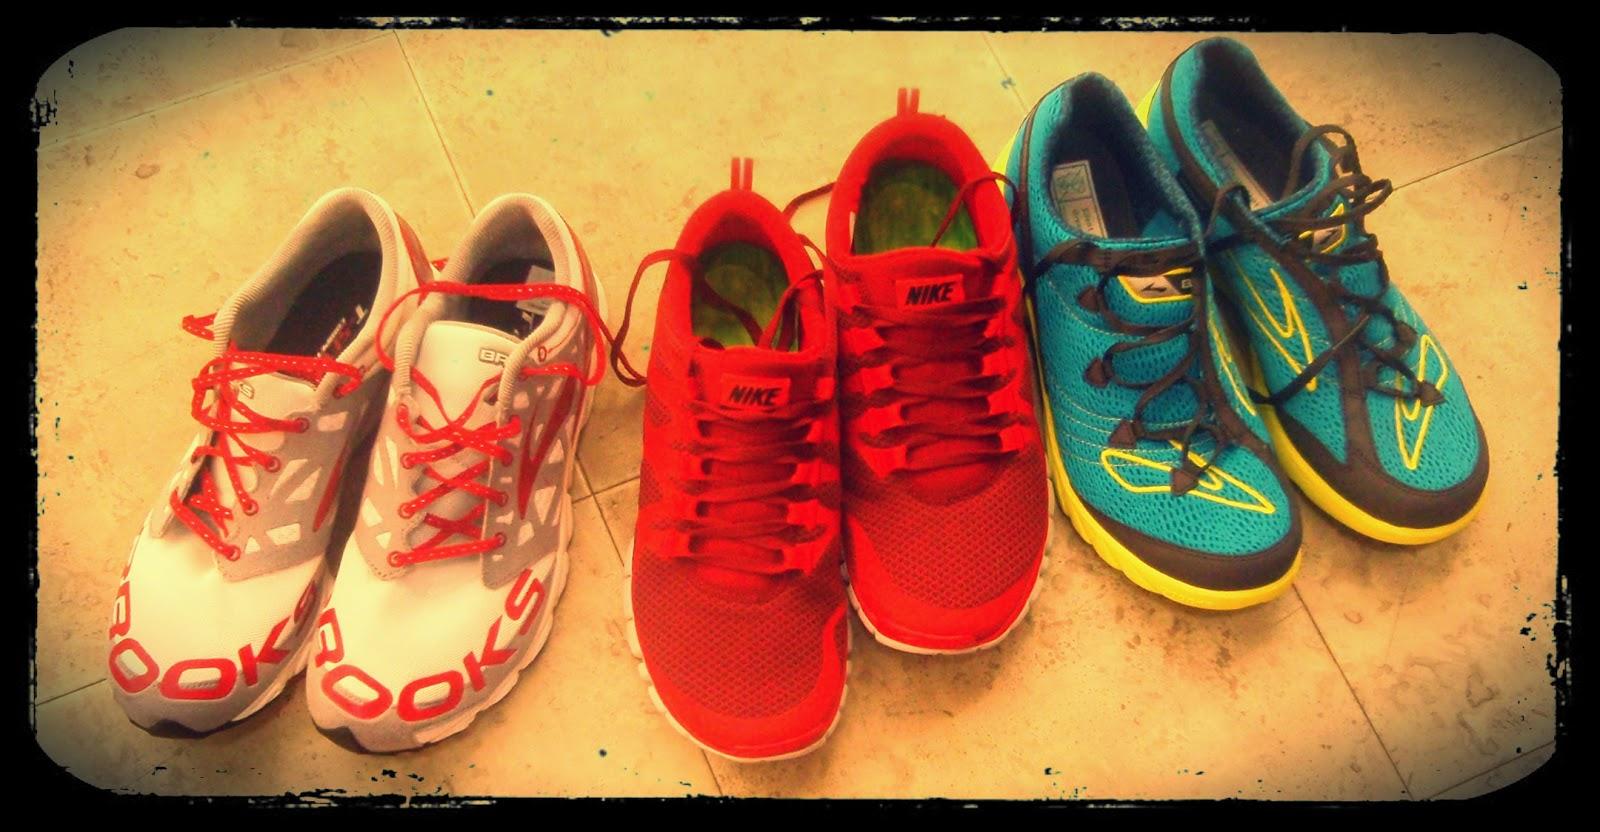 Sweatshop Free Running Shoes